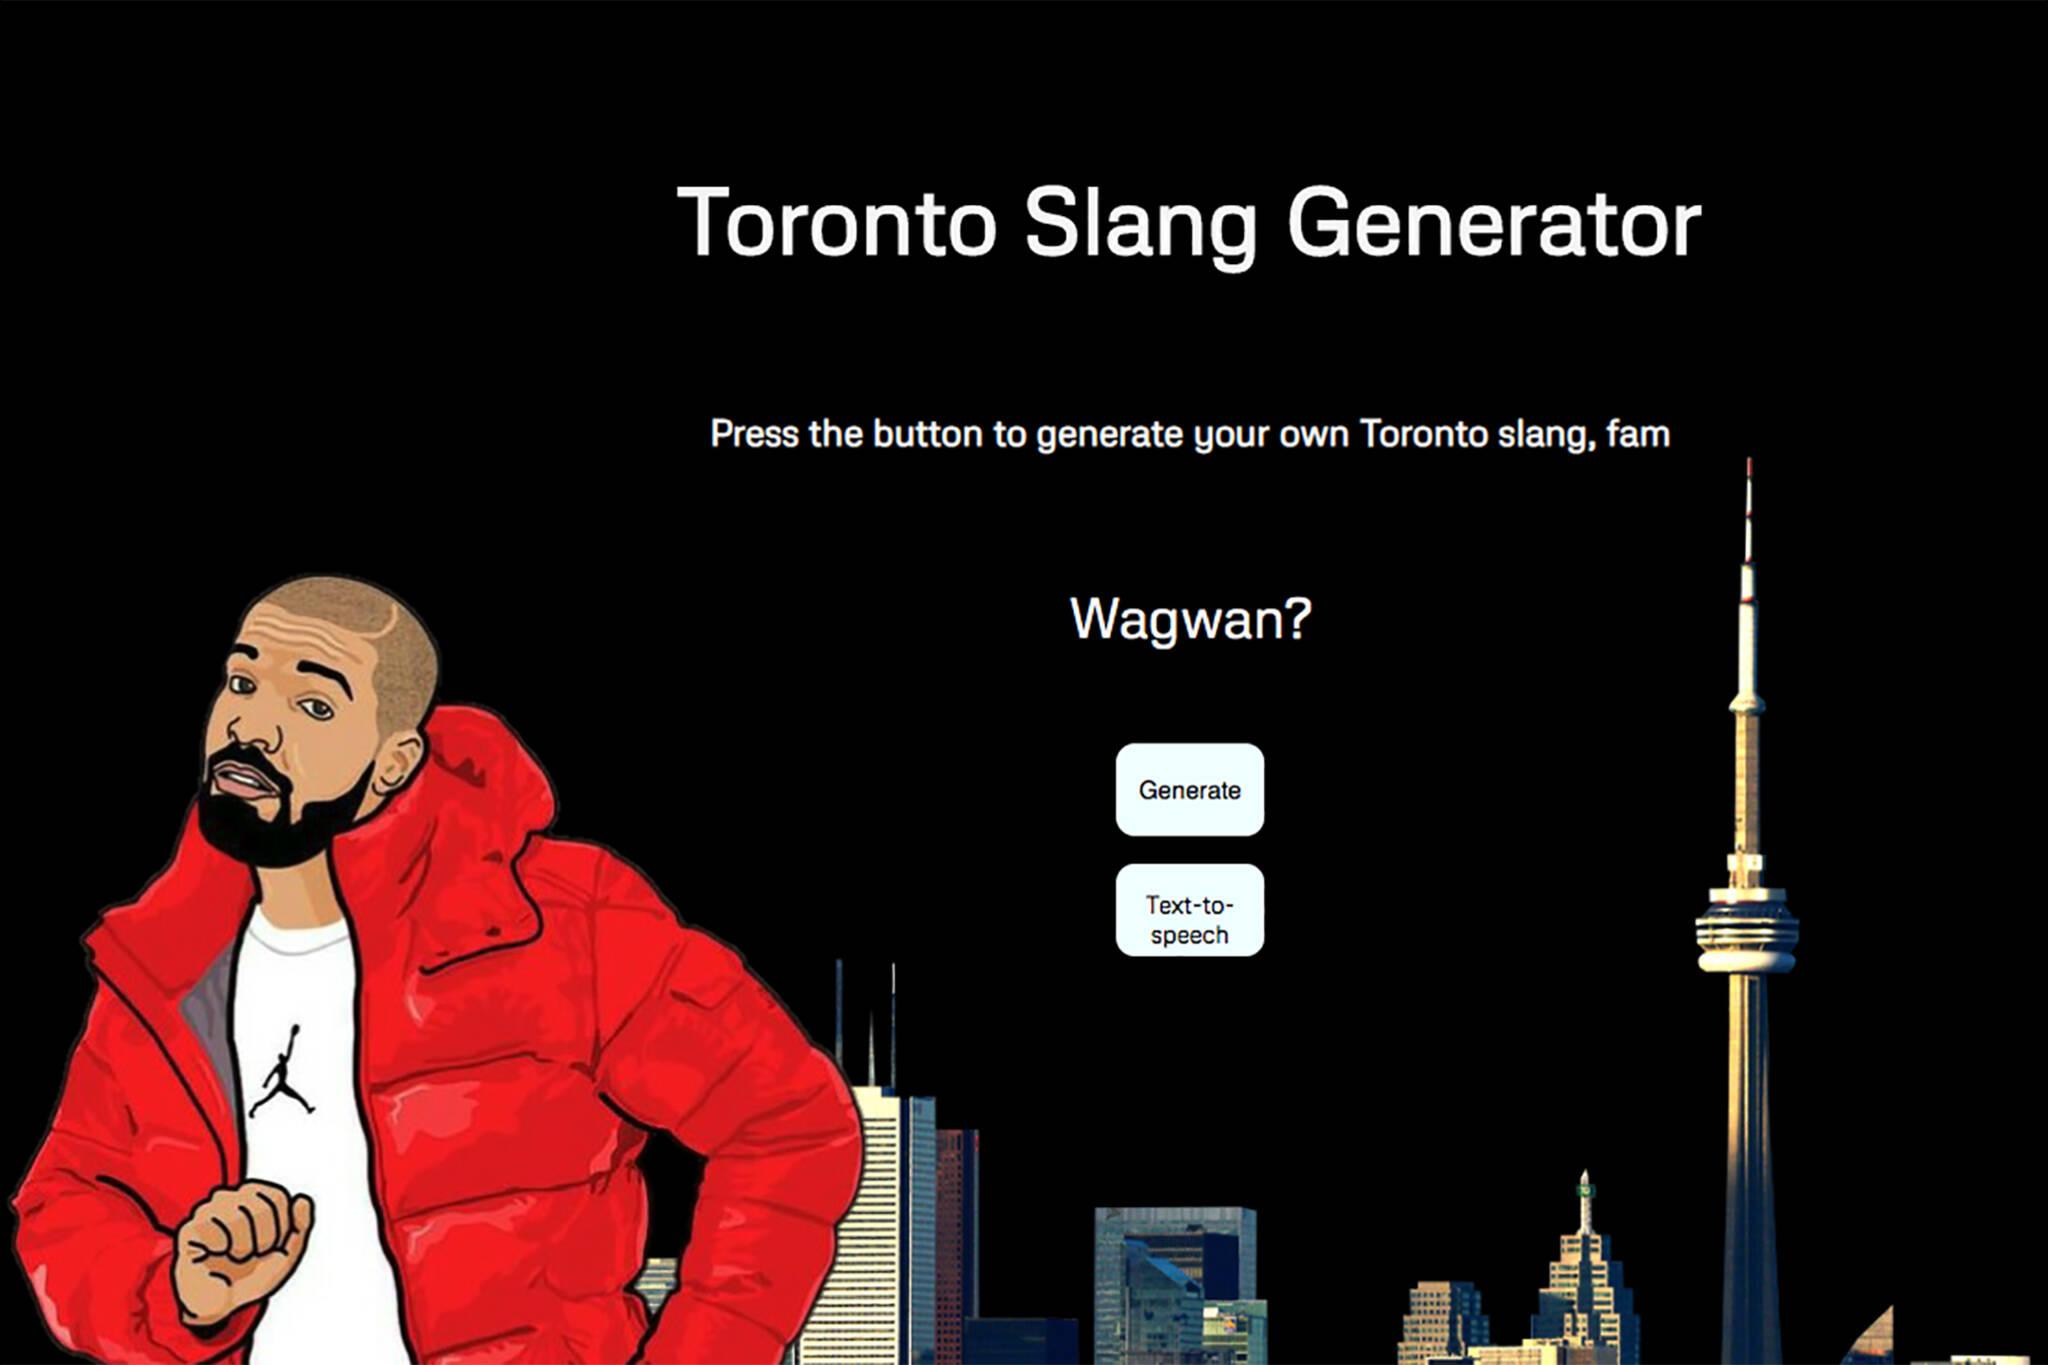 toronto slang generator